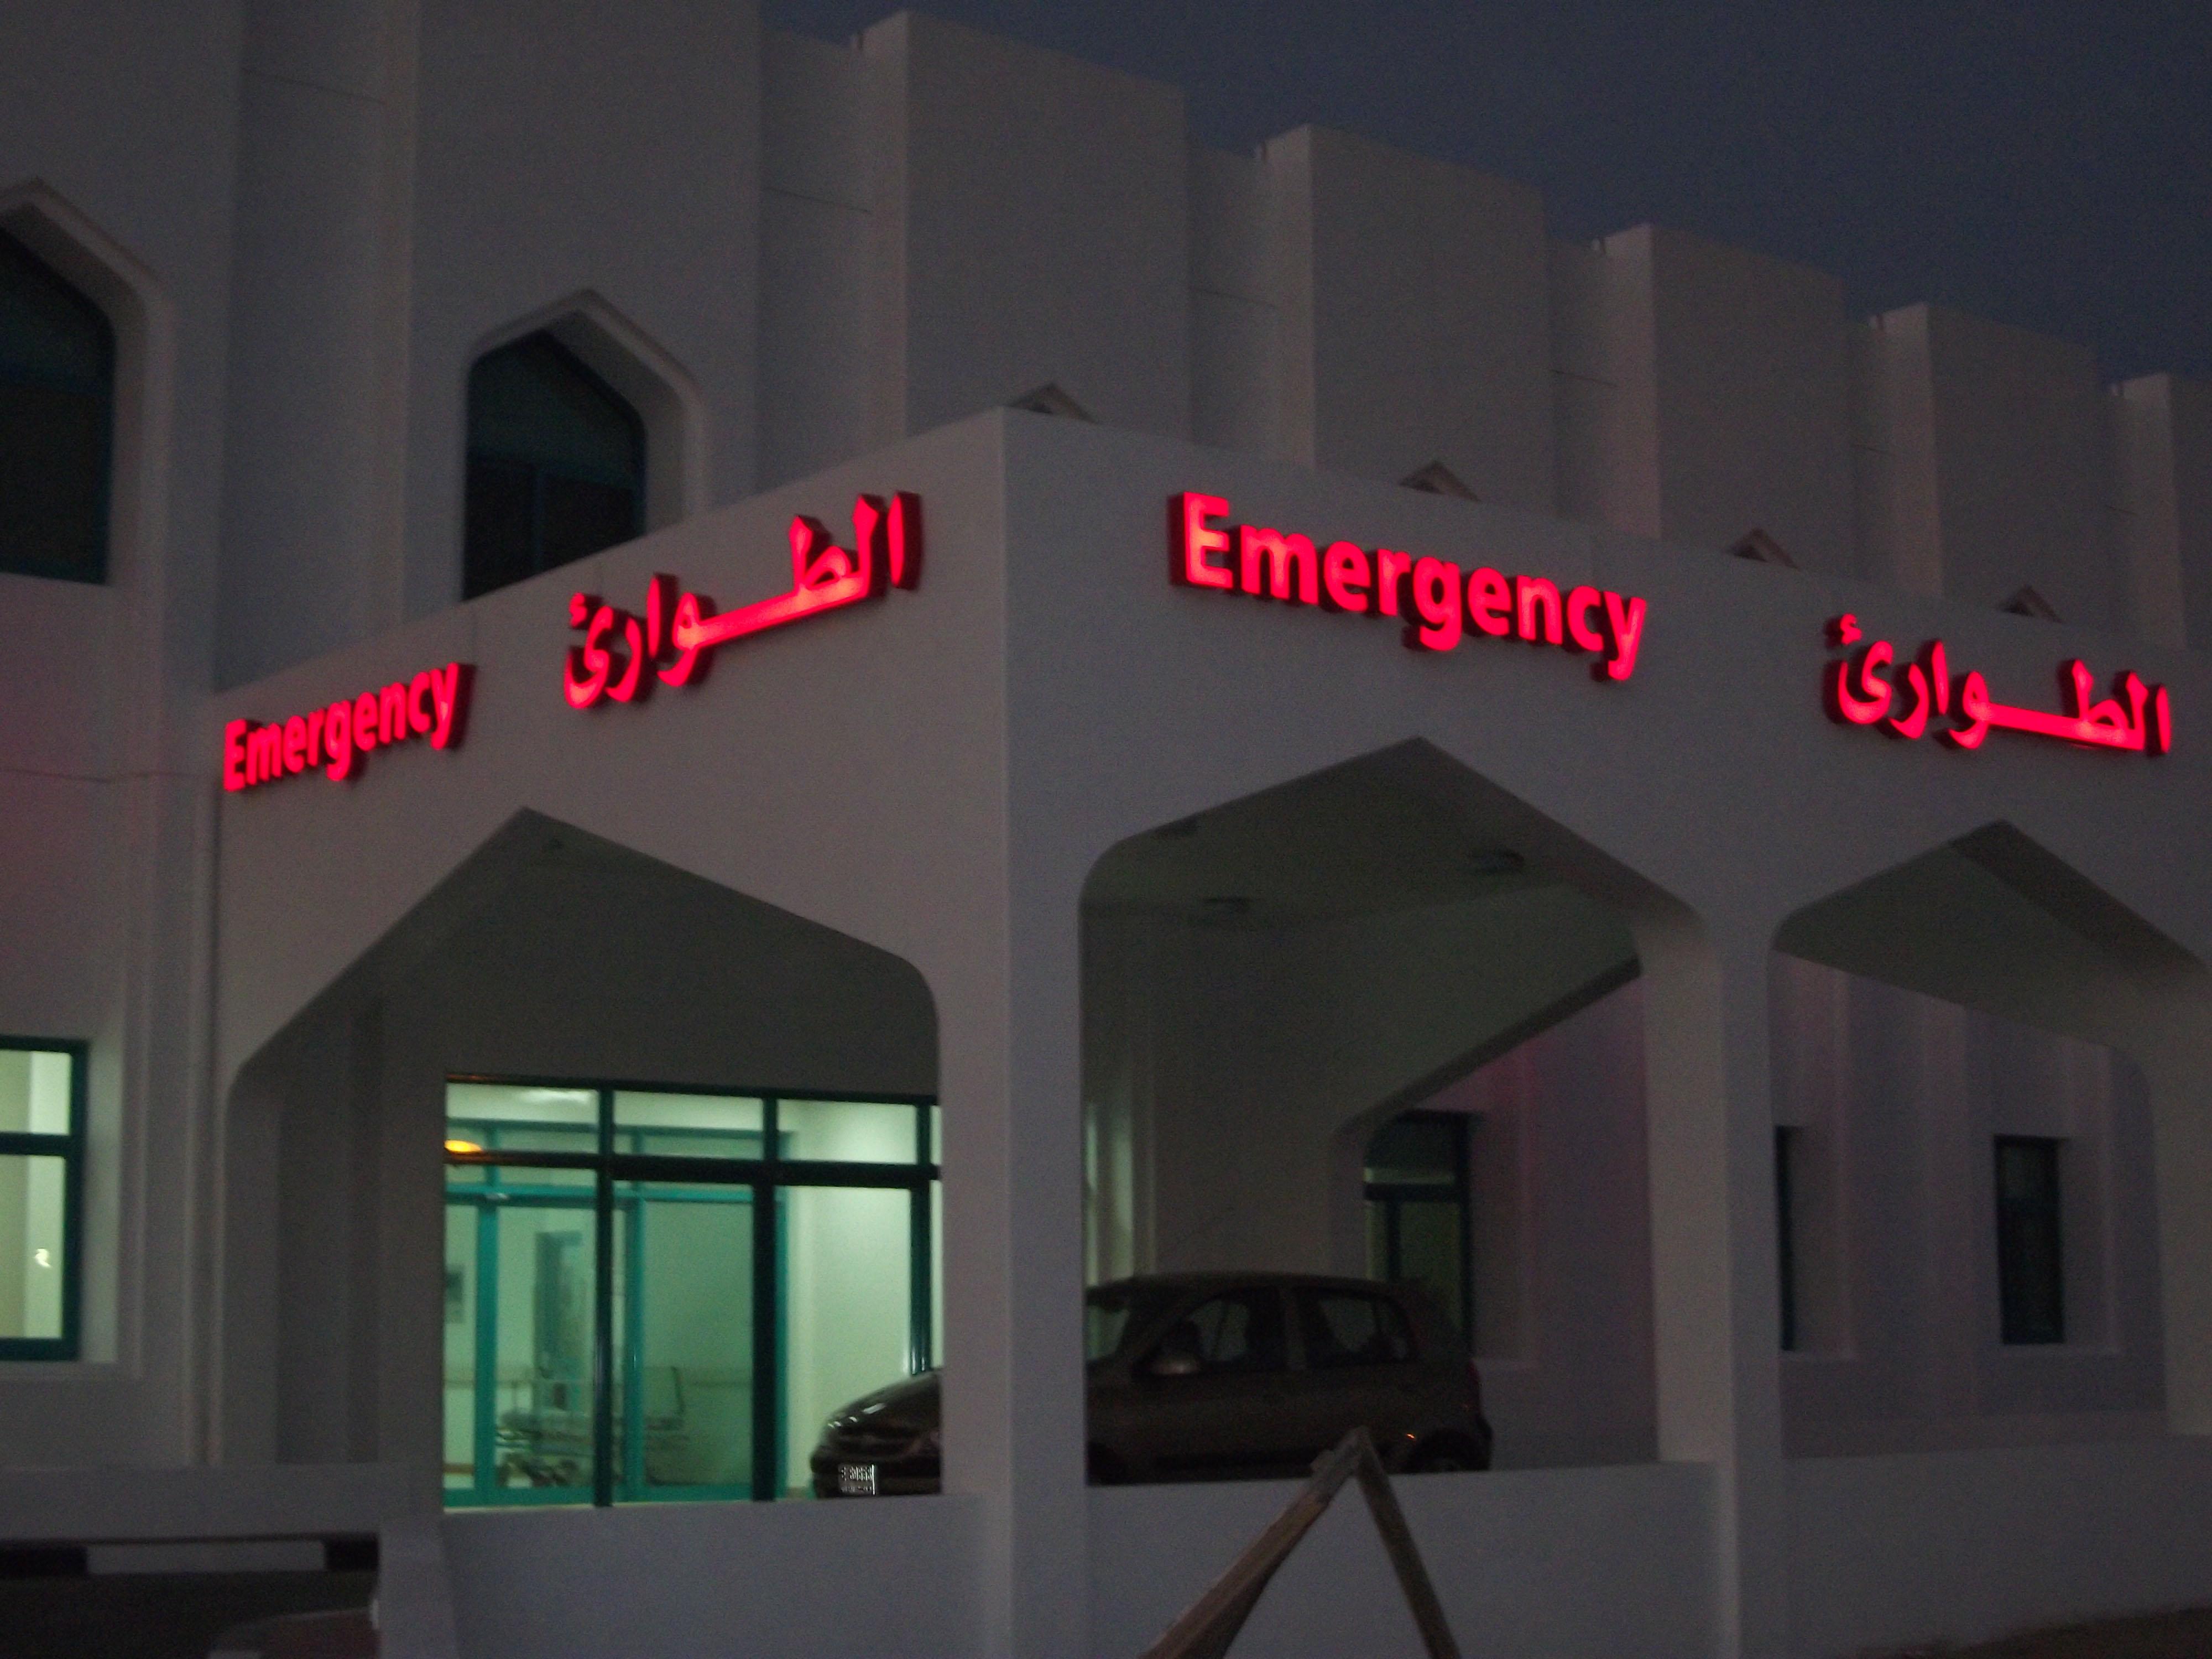 <h2>Emergency </h2><br/>